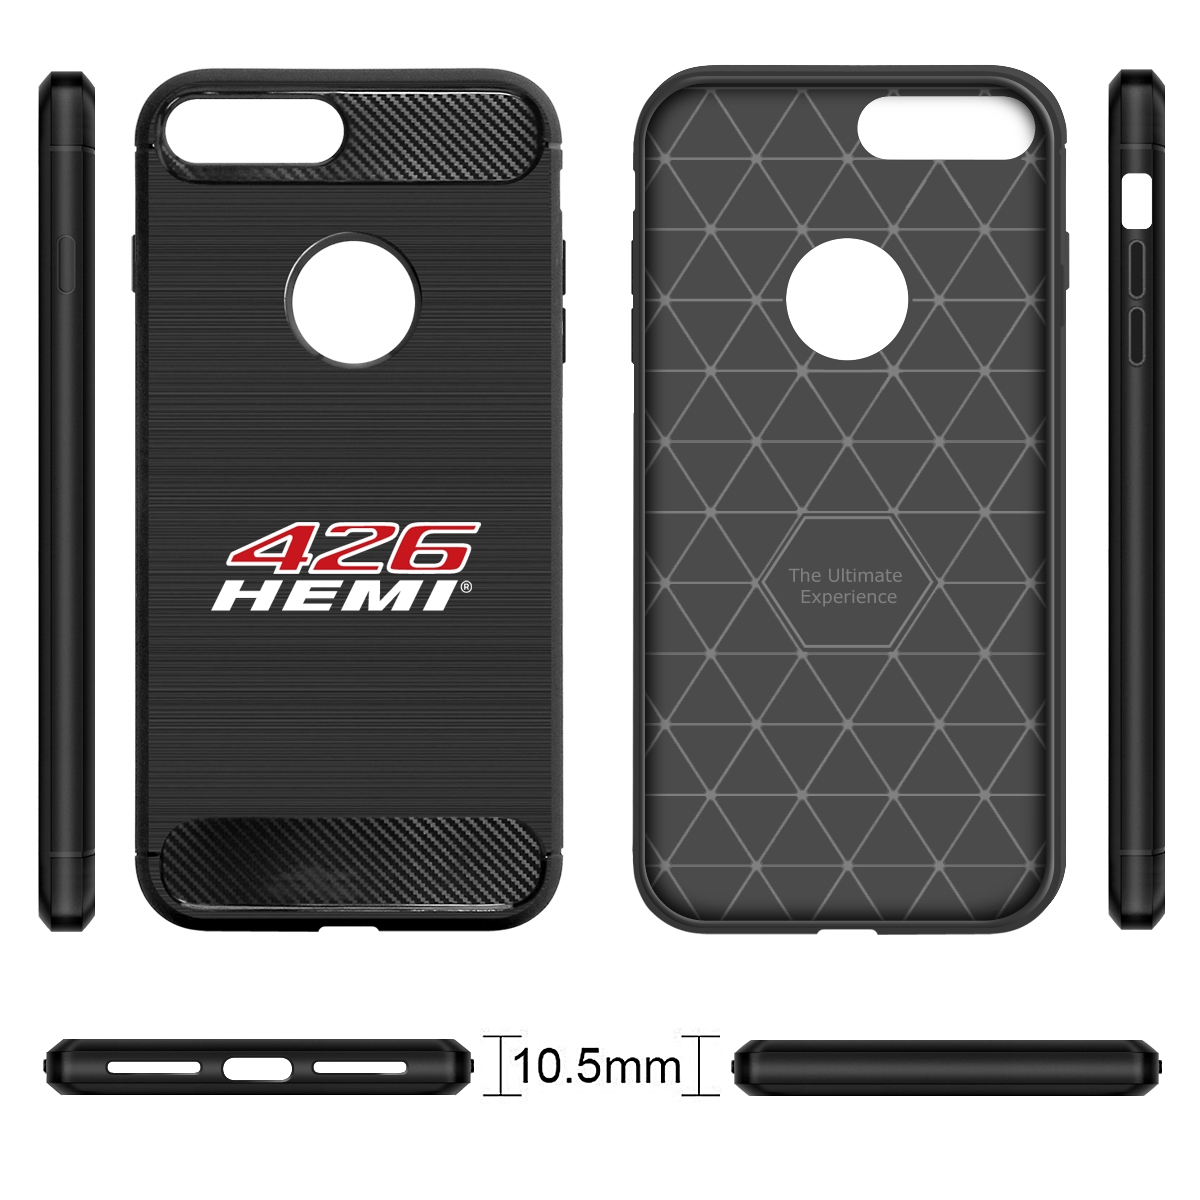 iPhone 7 Plus Case, HEMI 426 HP Black TPU Shockproof Carbon Fiber Textures Cell Phone Case